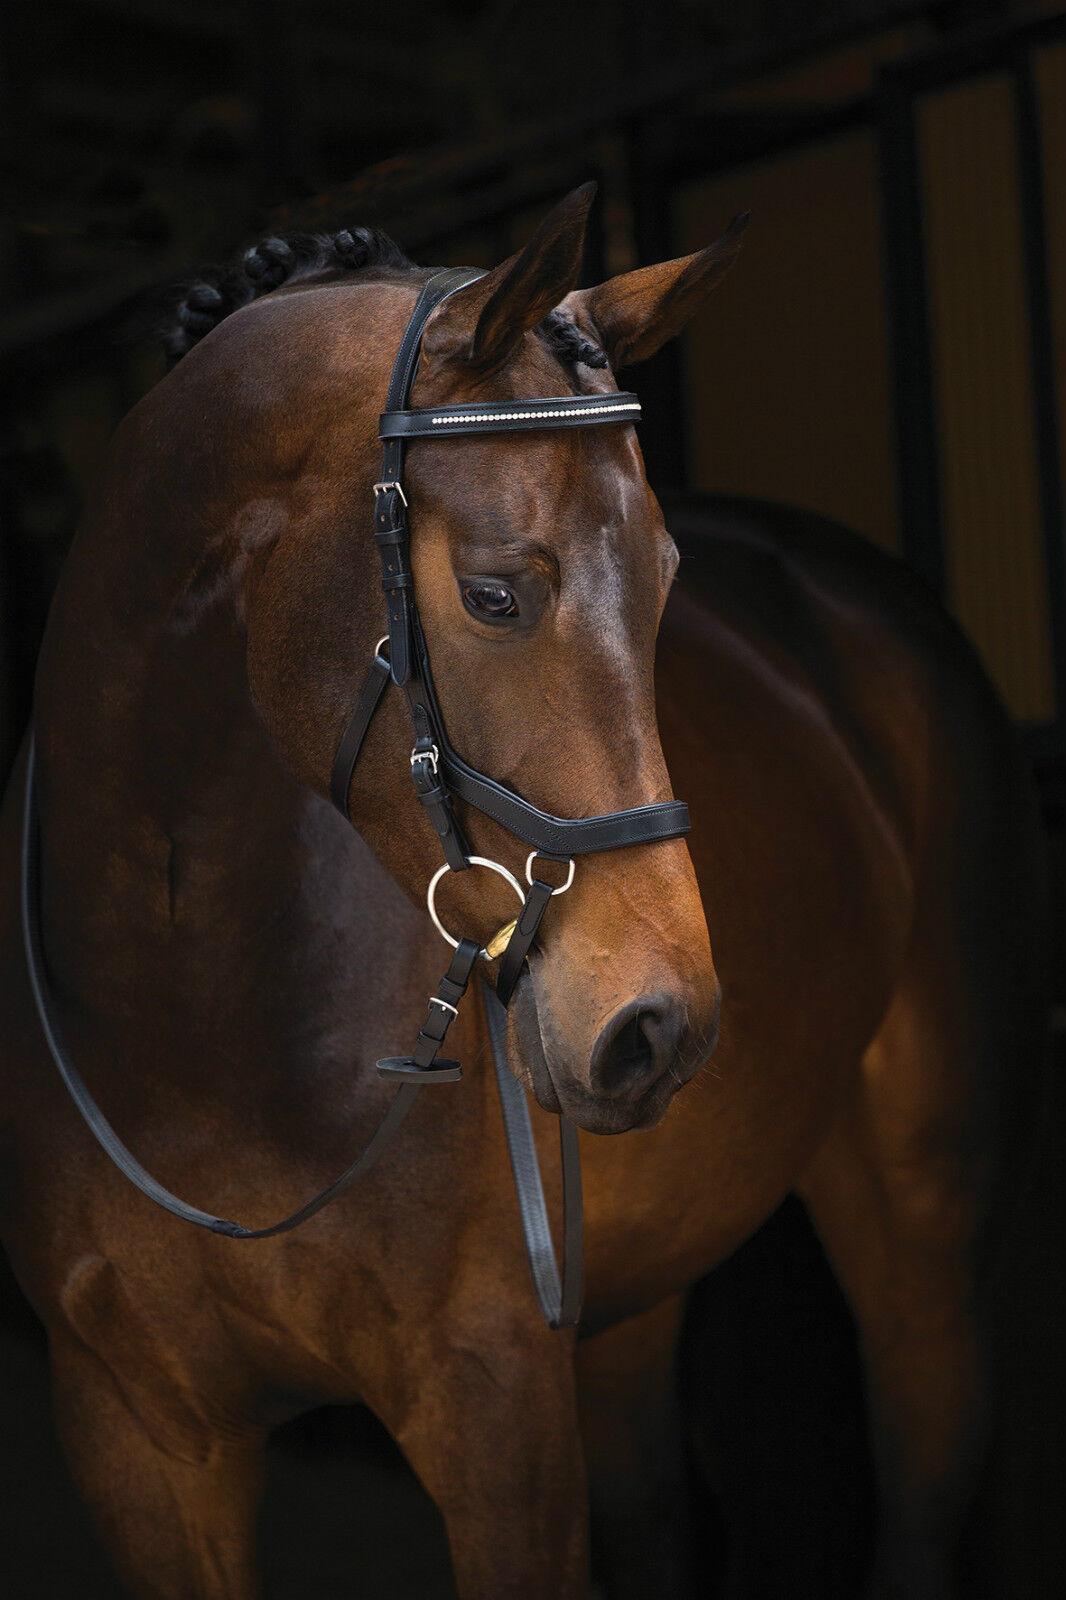 Horseware Rambo micklem diamante Competion Bridle, frenillo, logran contener